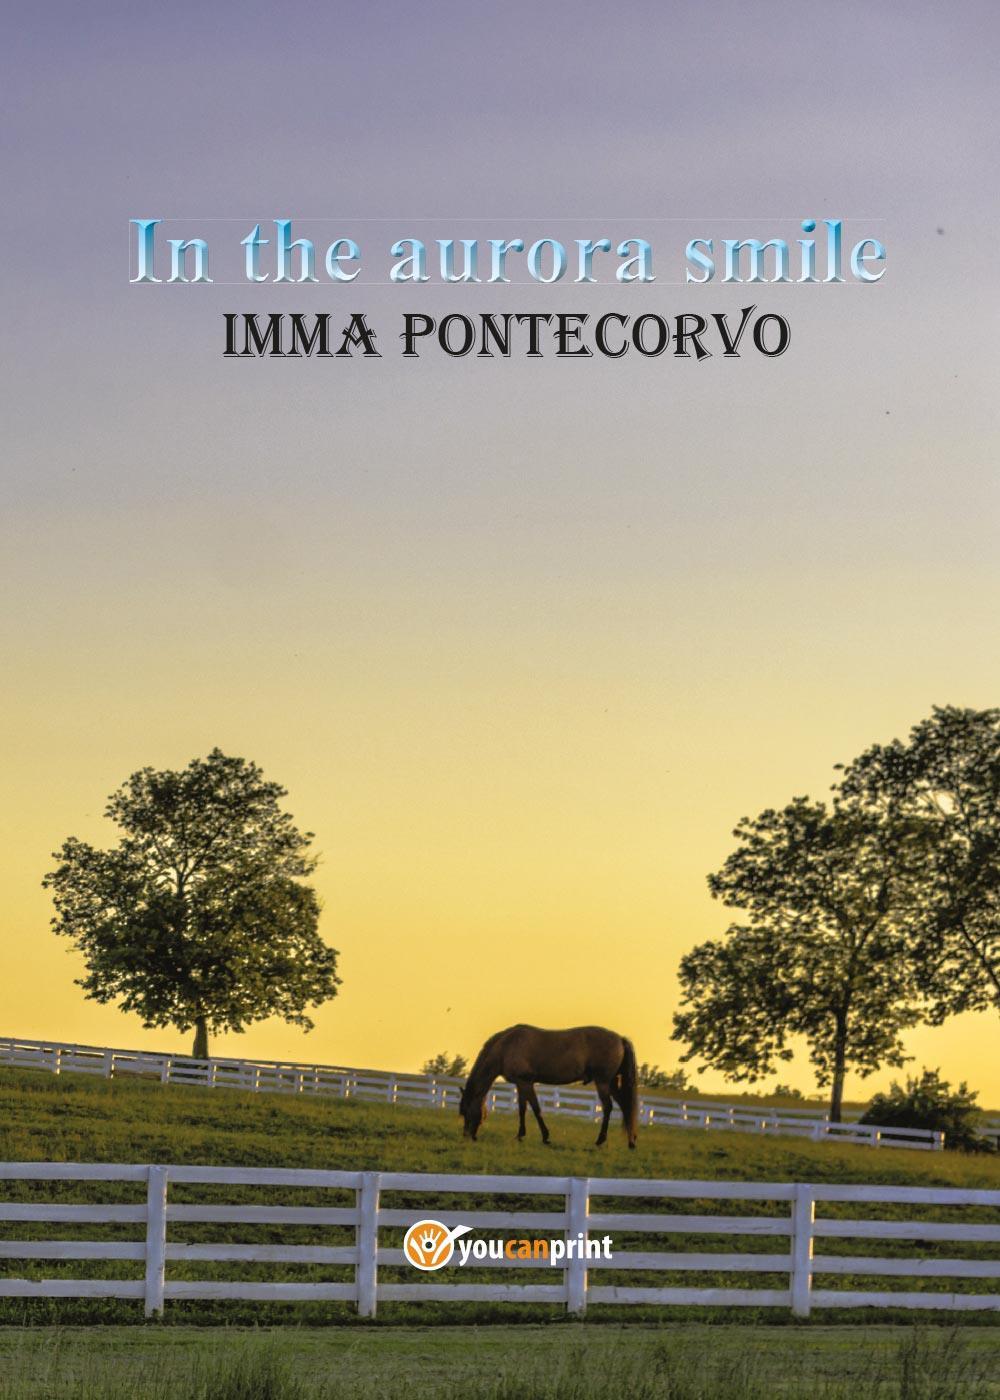 In the aurora smile